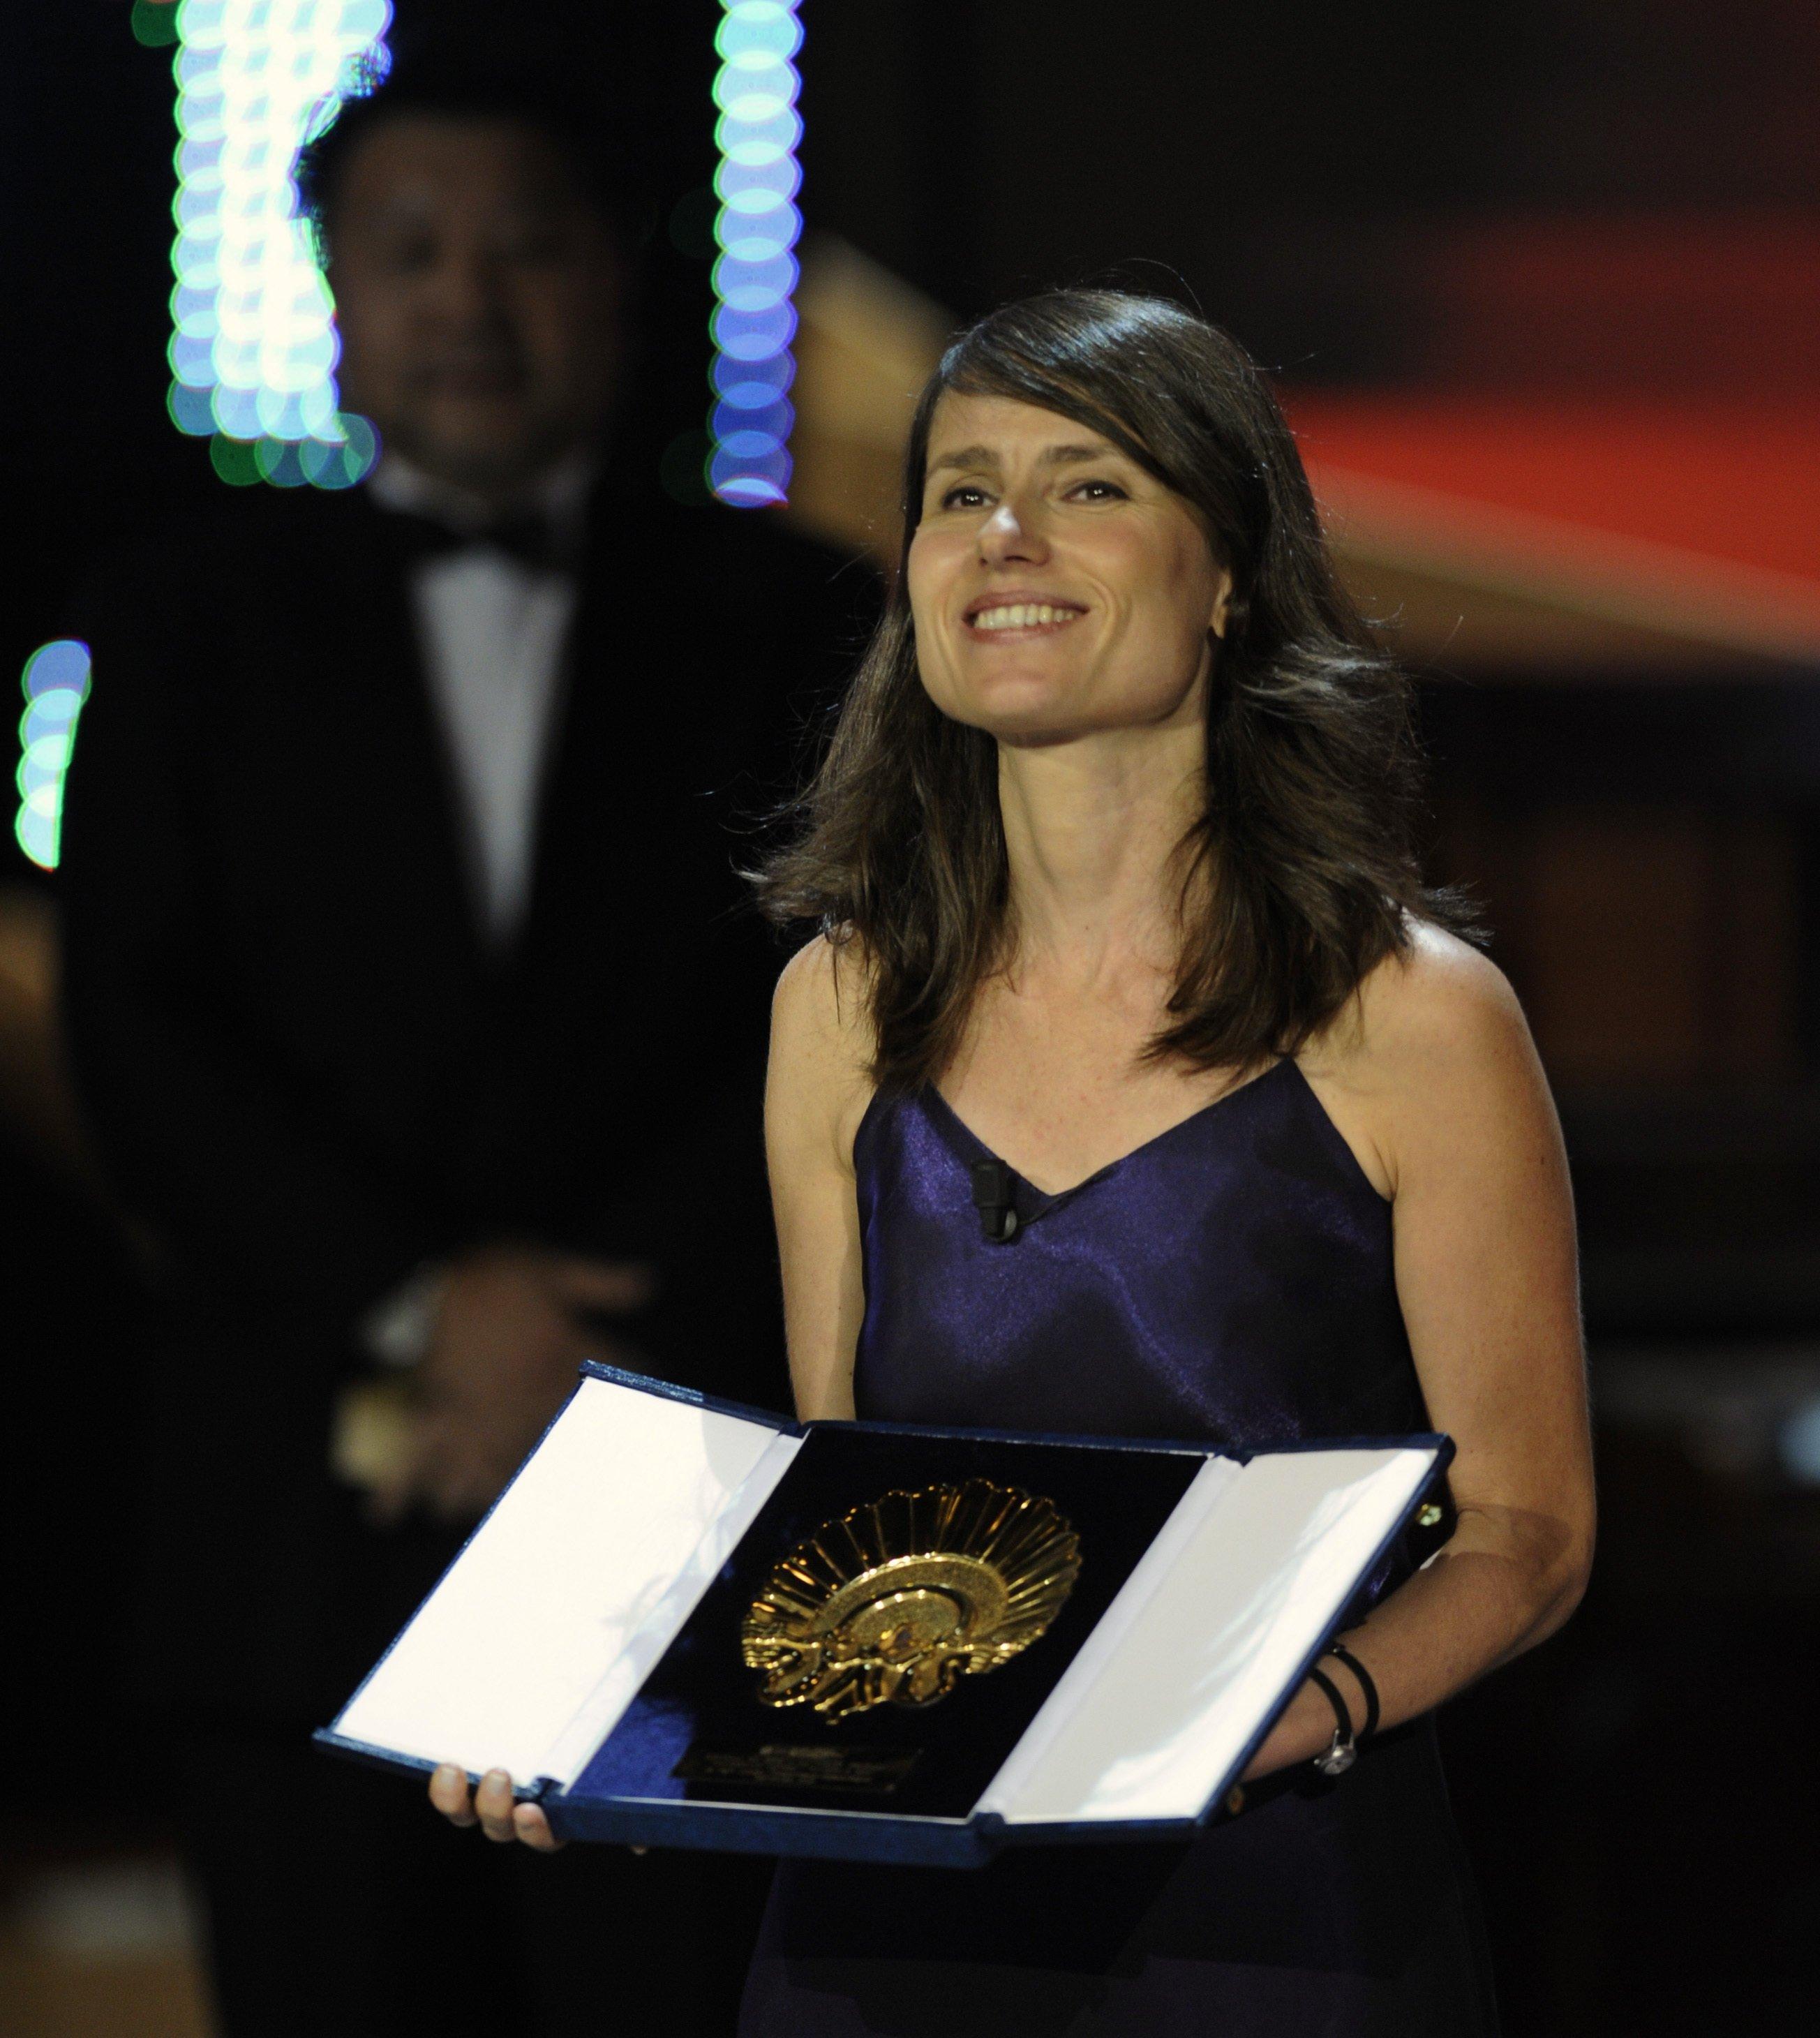 Turkish film director Yeşim Ustaoğlu holds up the Golden Shell award for best film 'Pandora's Box' at the San Sebastian International Film Festival in San Sebastian, September 27, 2008. (REUTERS Photo)